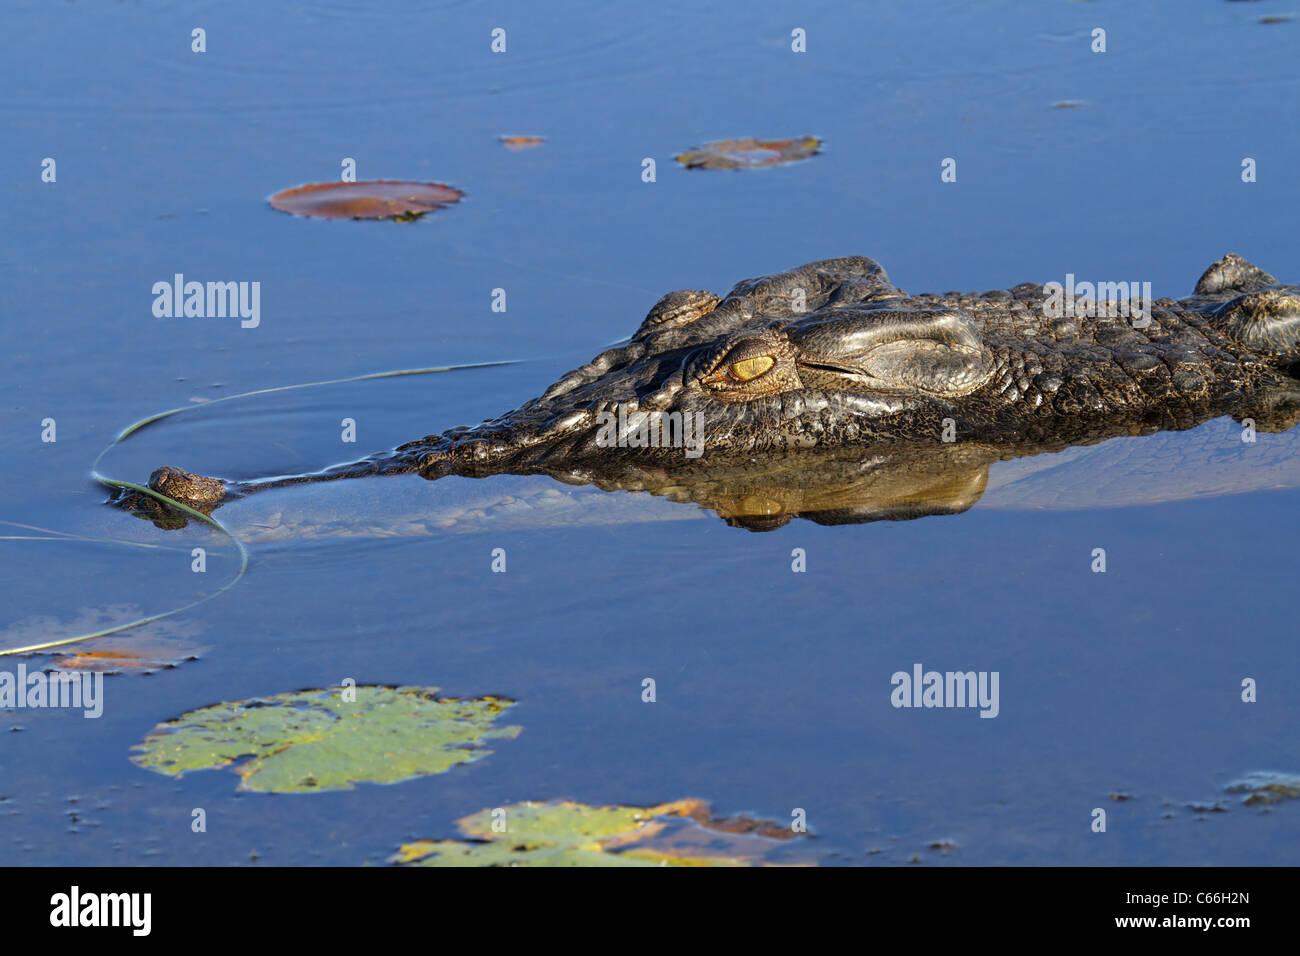 Large saltwater crocodile, Yellow water billabong, Kakadu National Park, Northern Territory, Australia Stock Photo